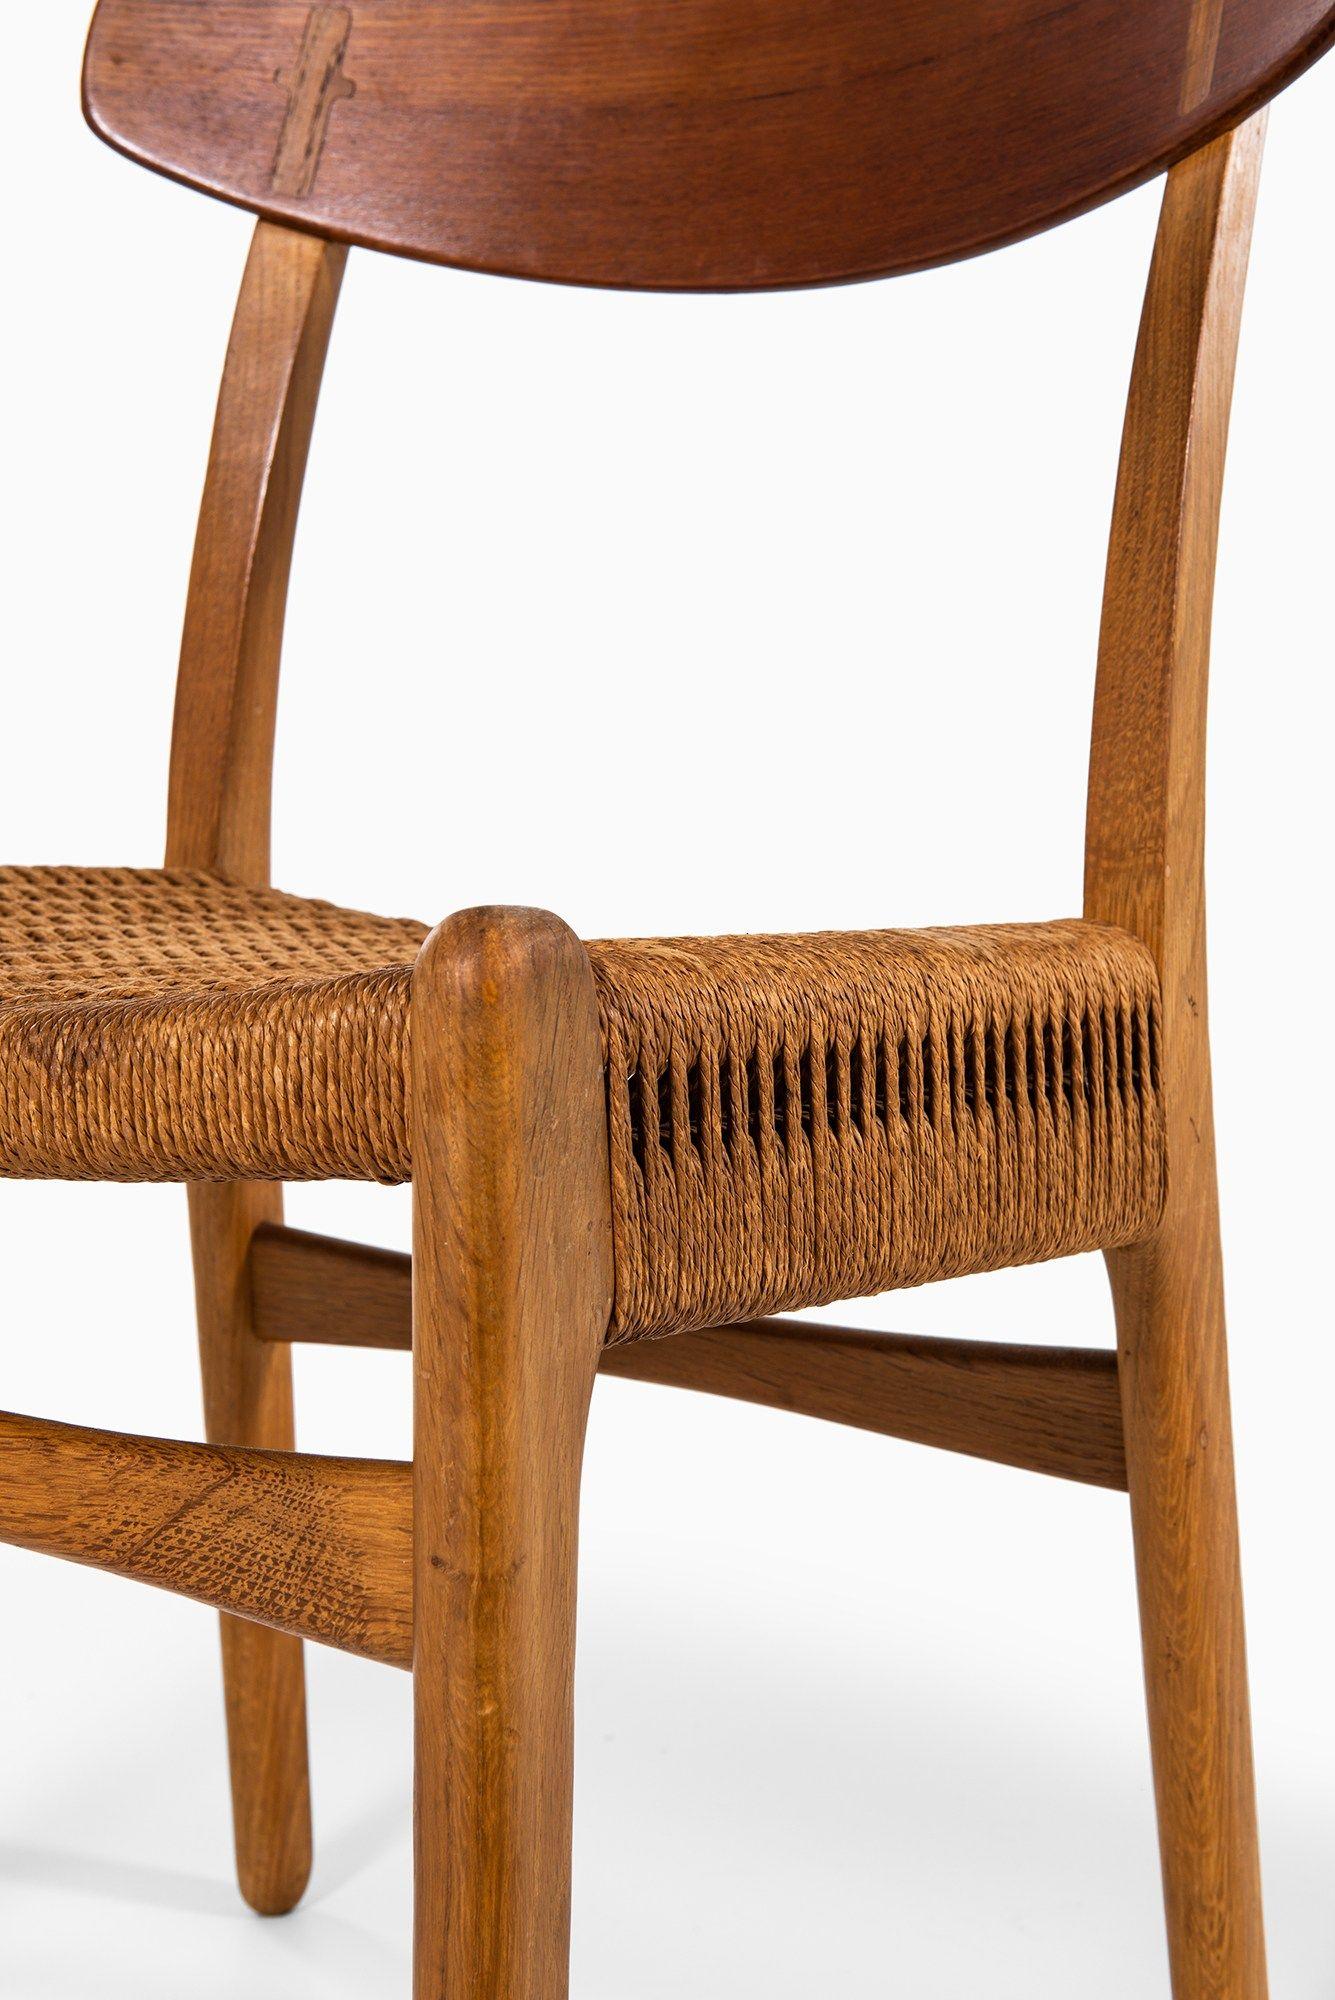 Hans Wegner Ch 23 Dining Chairs Mobler